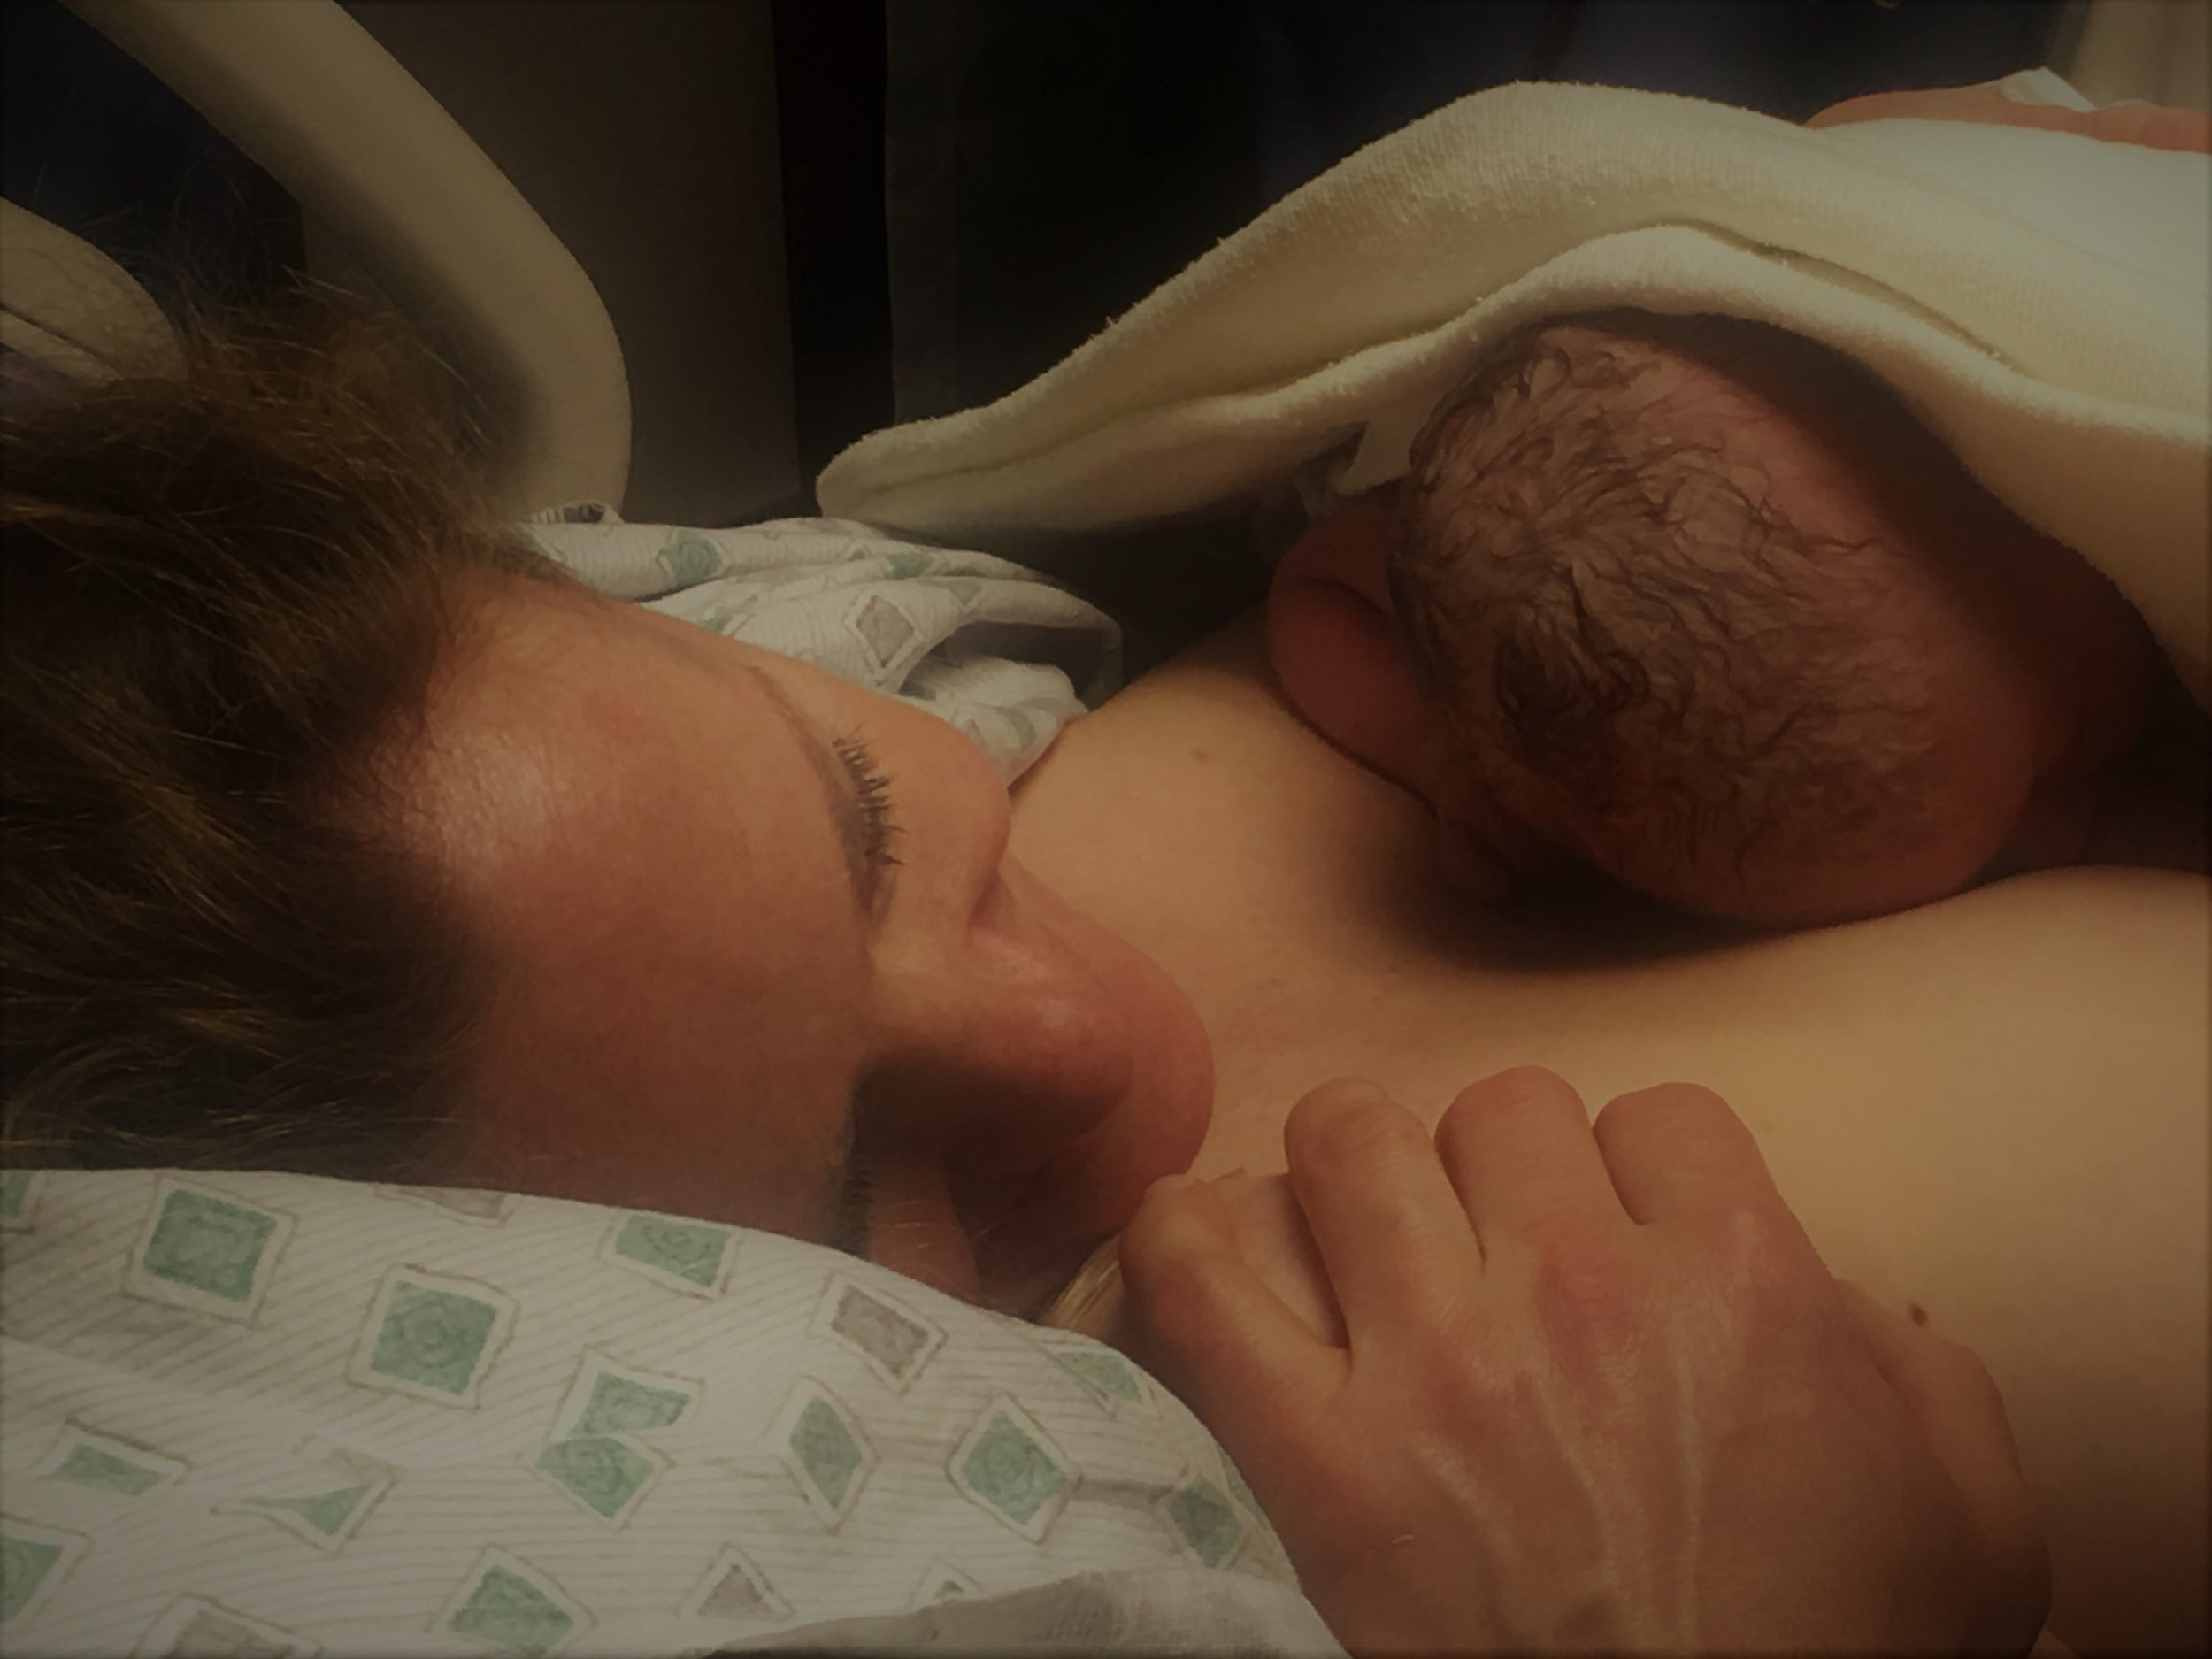 Dad's hand on mom's shoulder: I  love you both